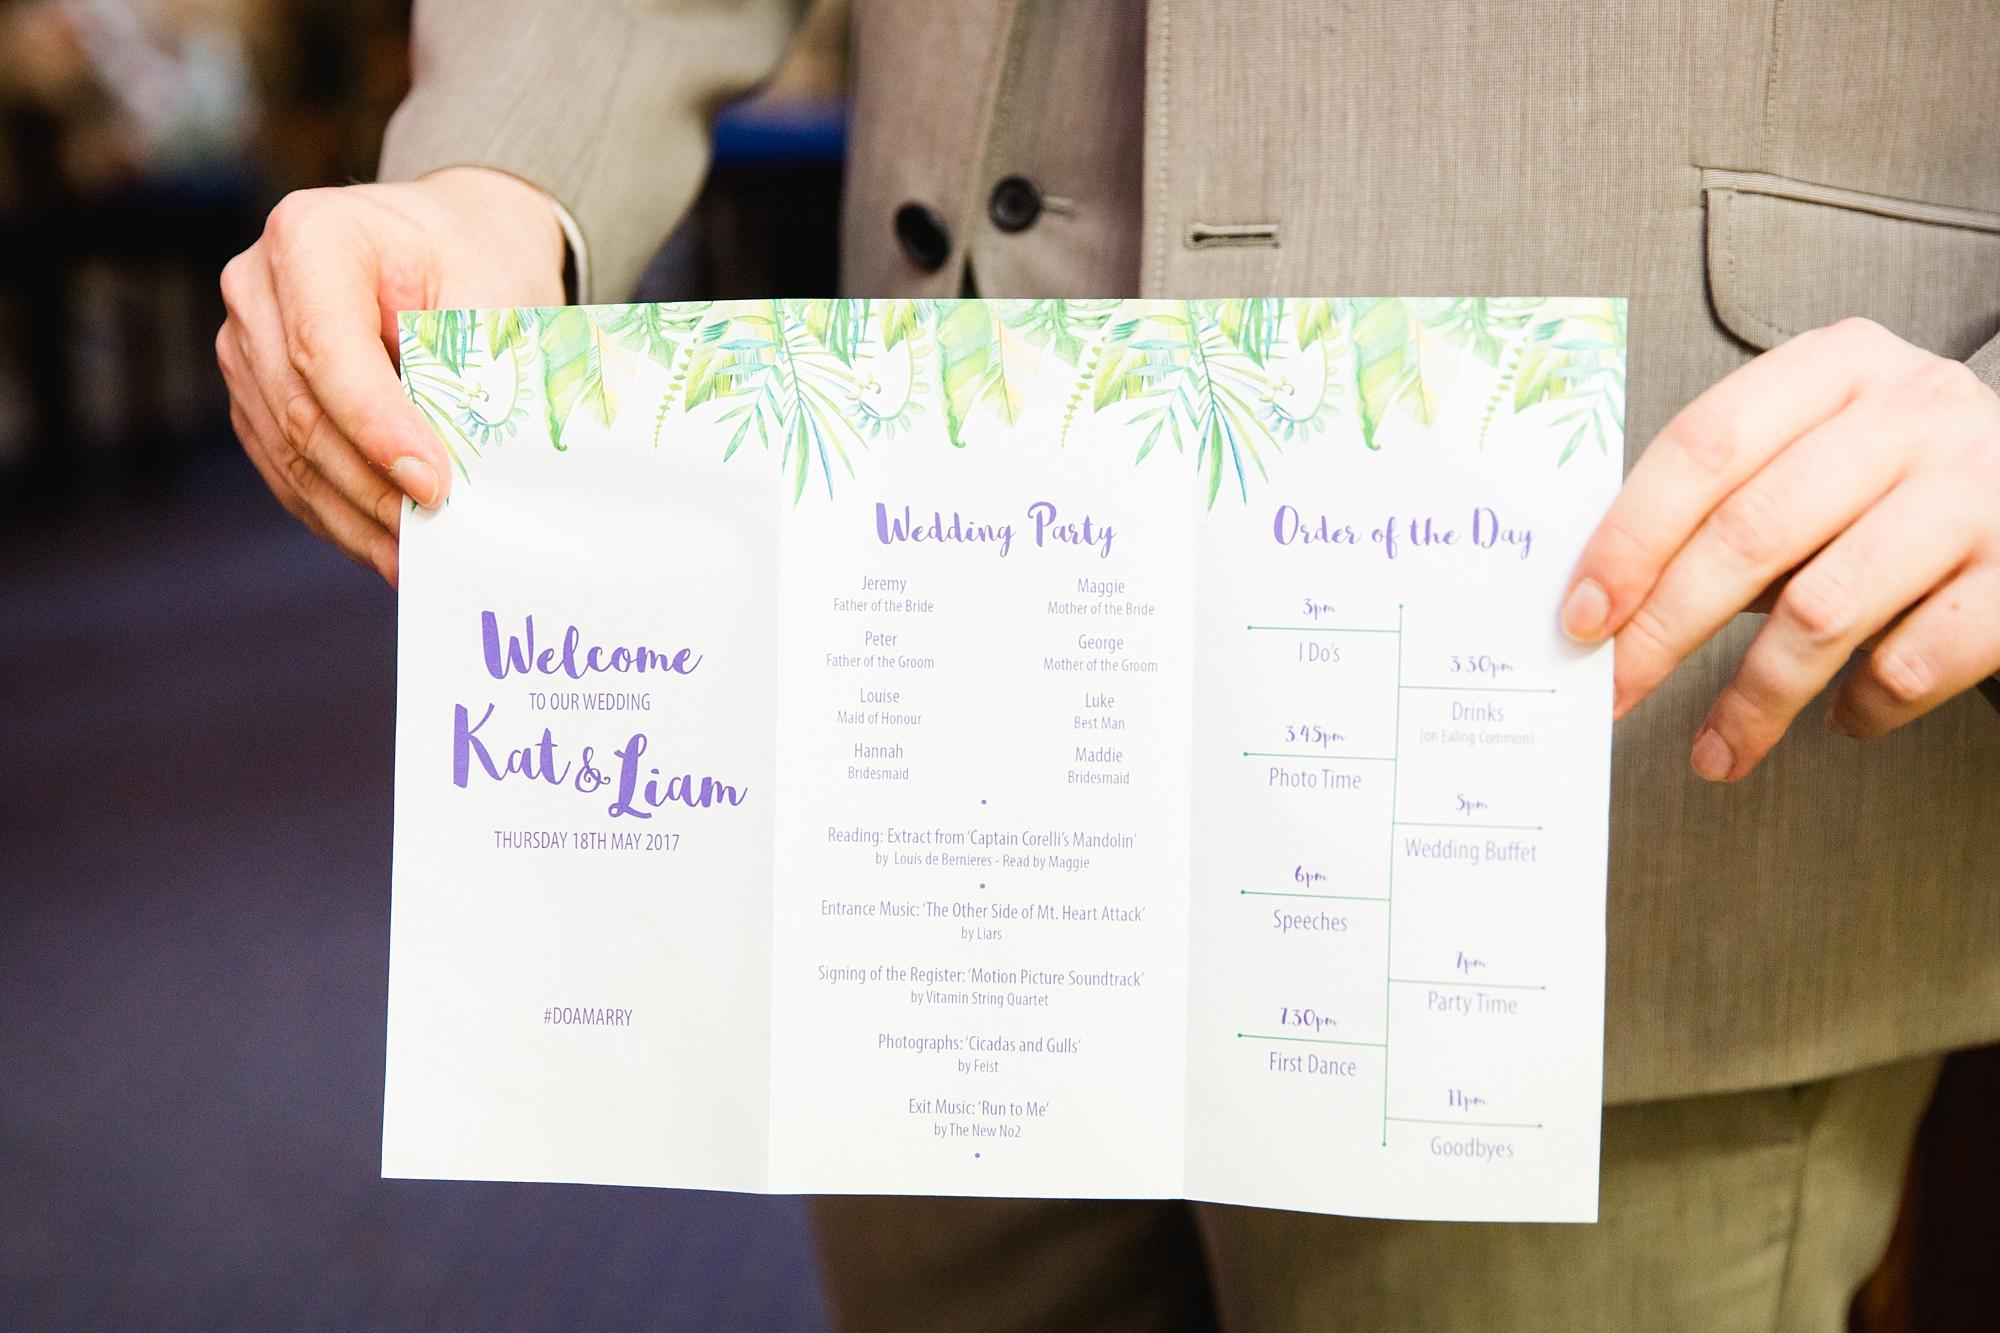 The Grange Ealing wedding close up detail of tropical theme wedding program